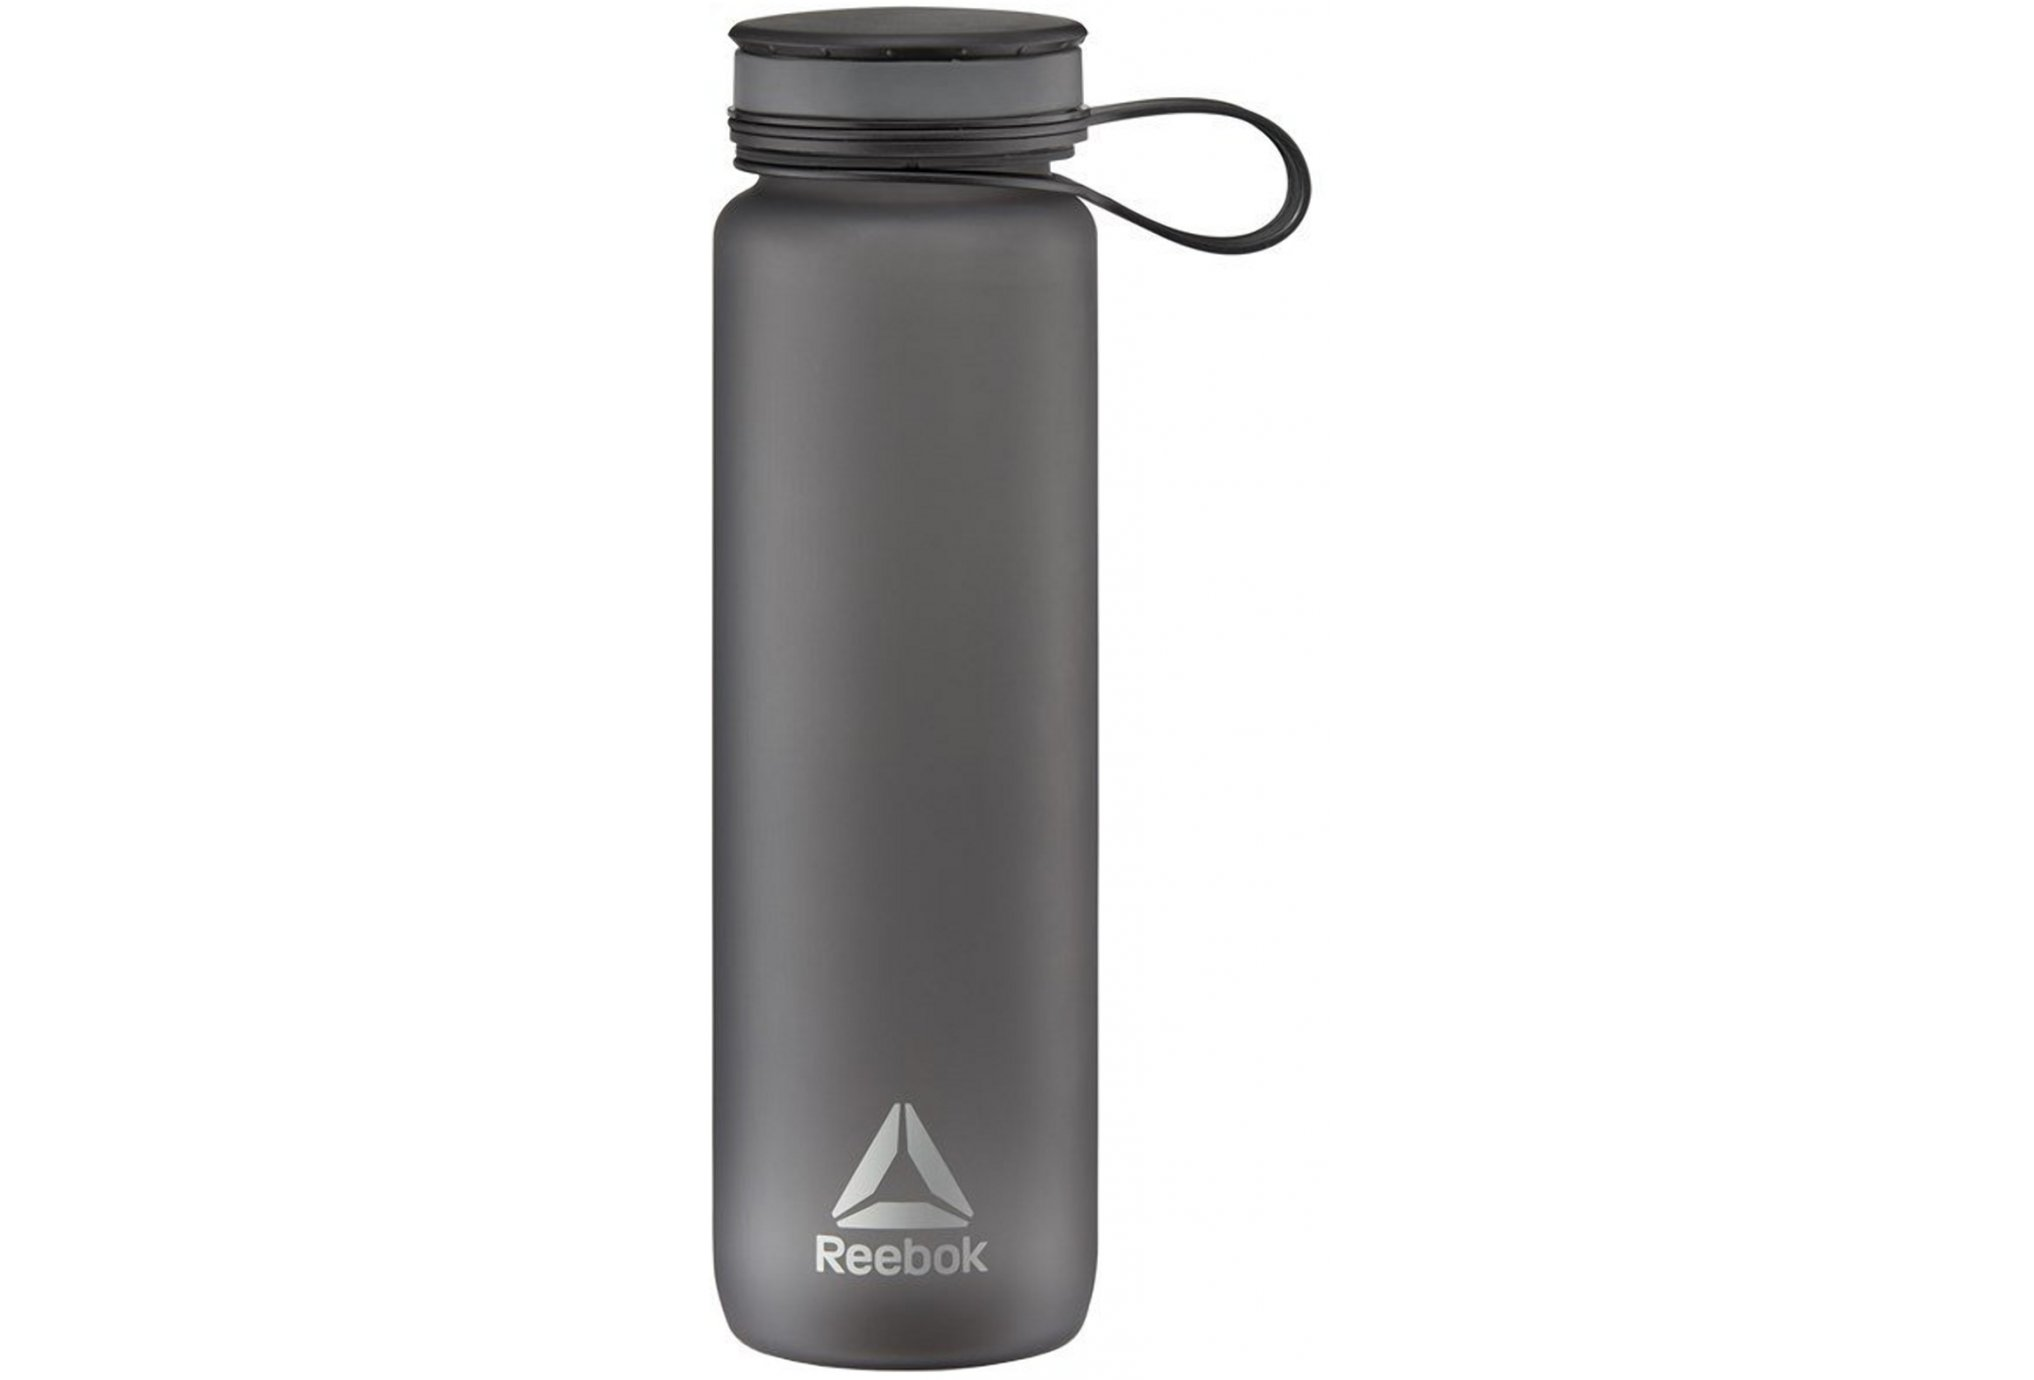 Reebok Water Bottle - 1000mL Sac hydratation / Gourde